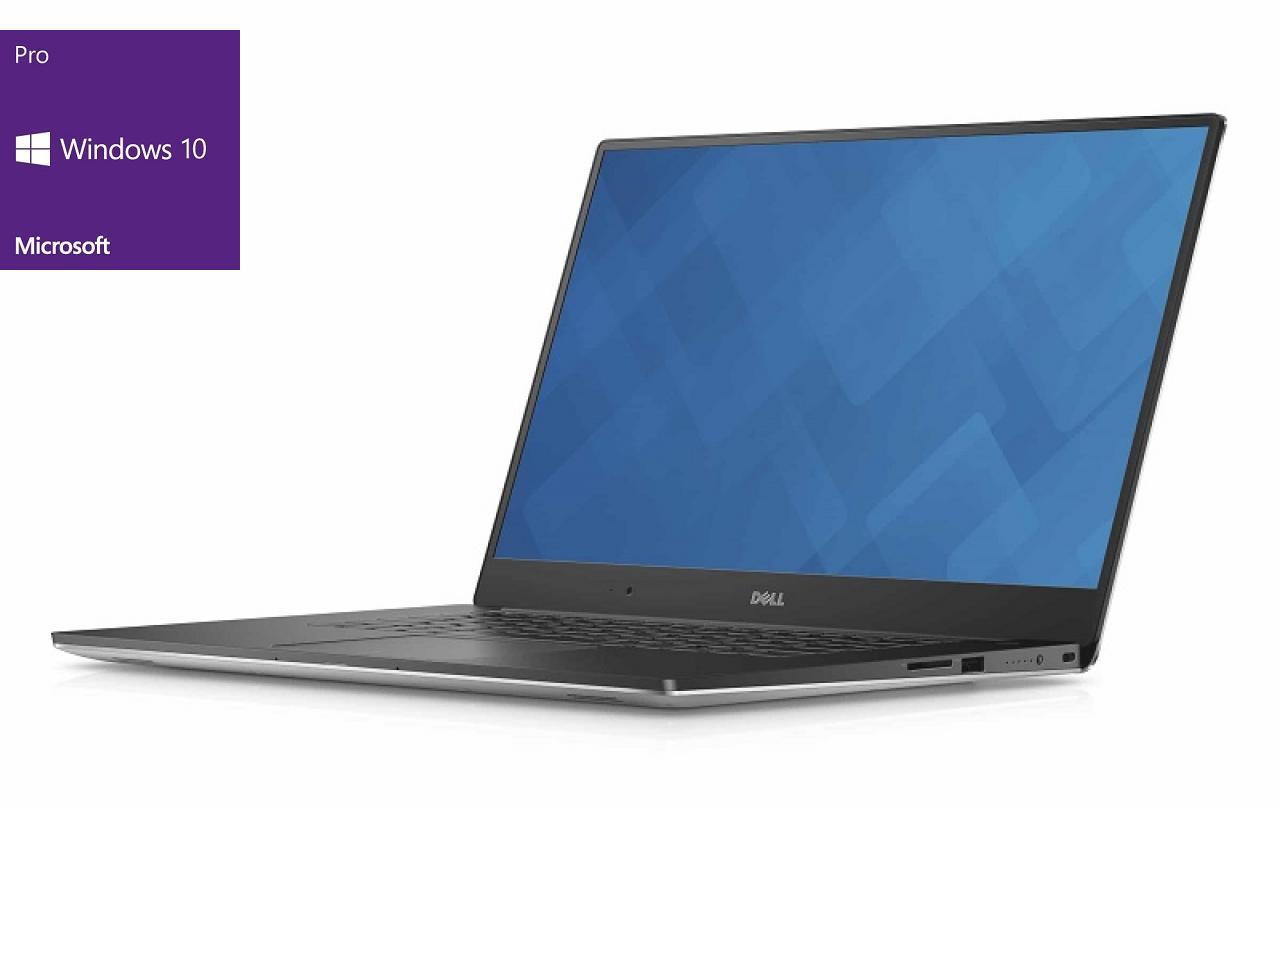 Dell Precision 5510  - shop.bb-net.de